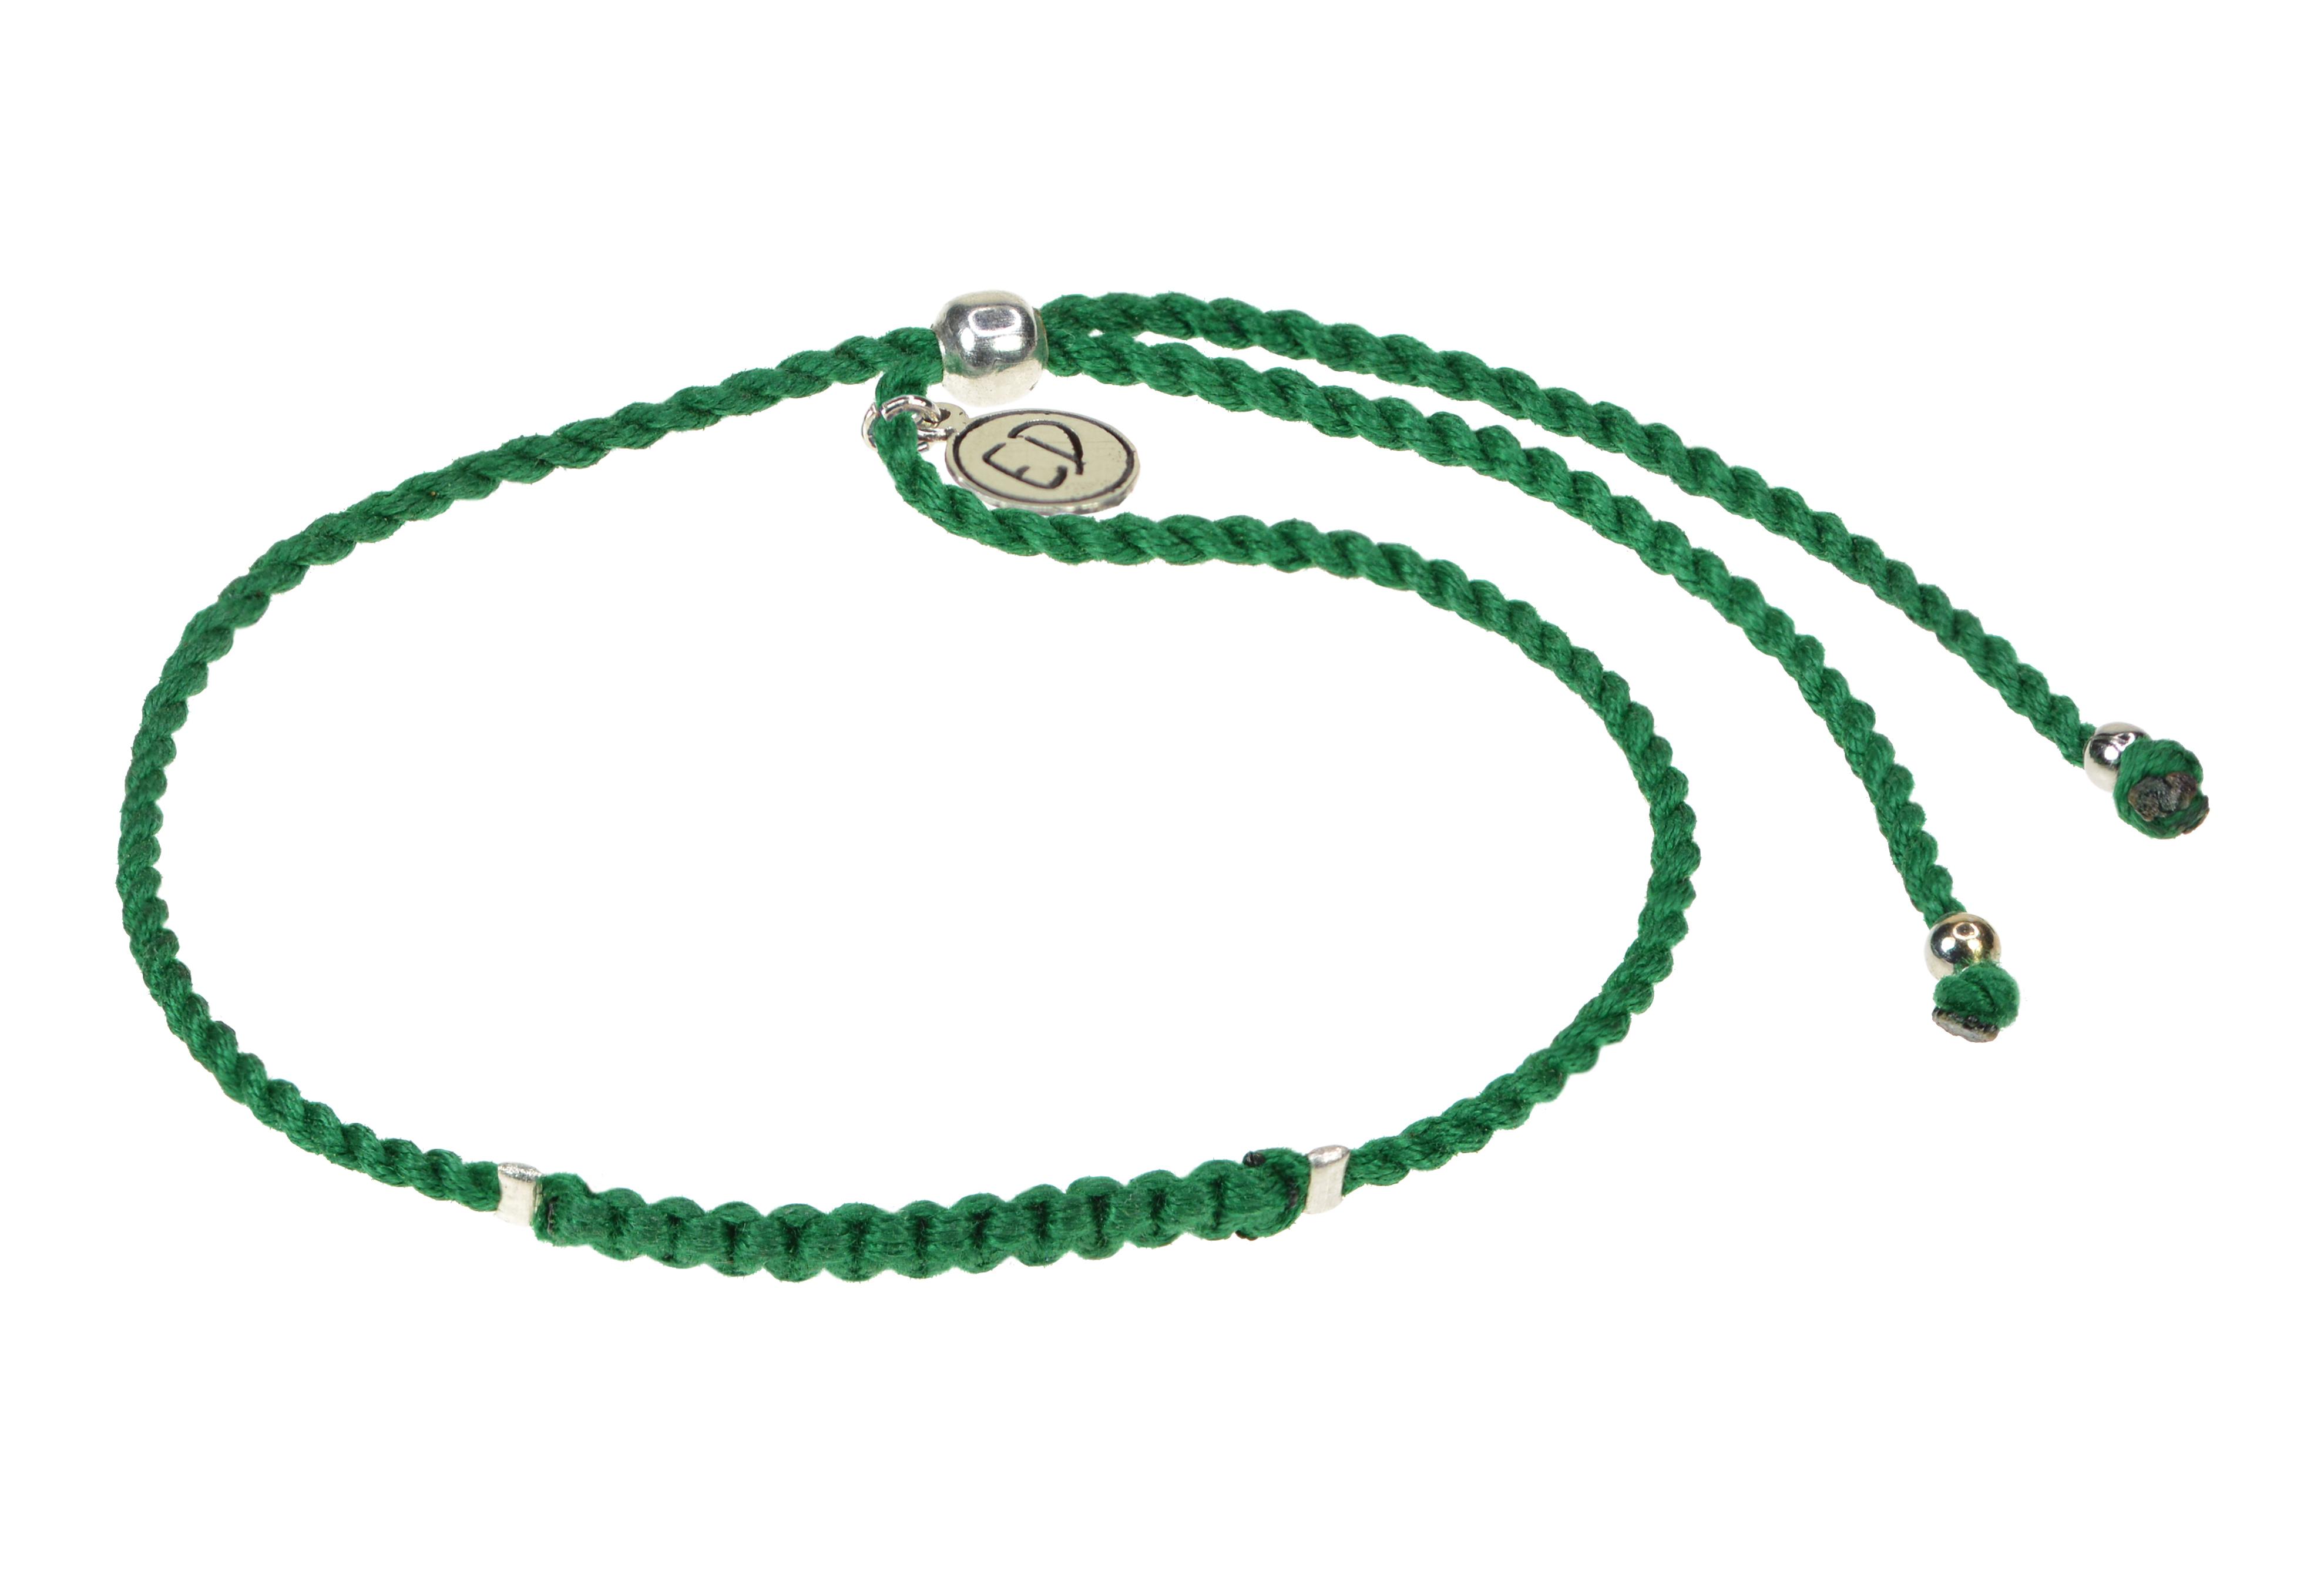 Dámsky pletený náramok s korálkami  - zelený